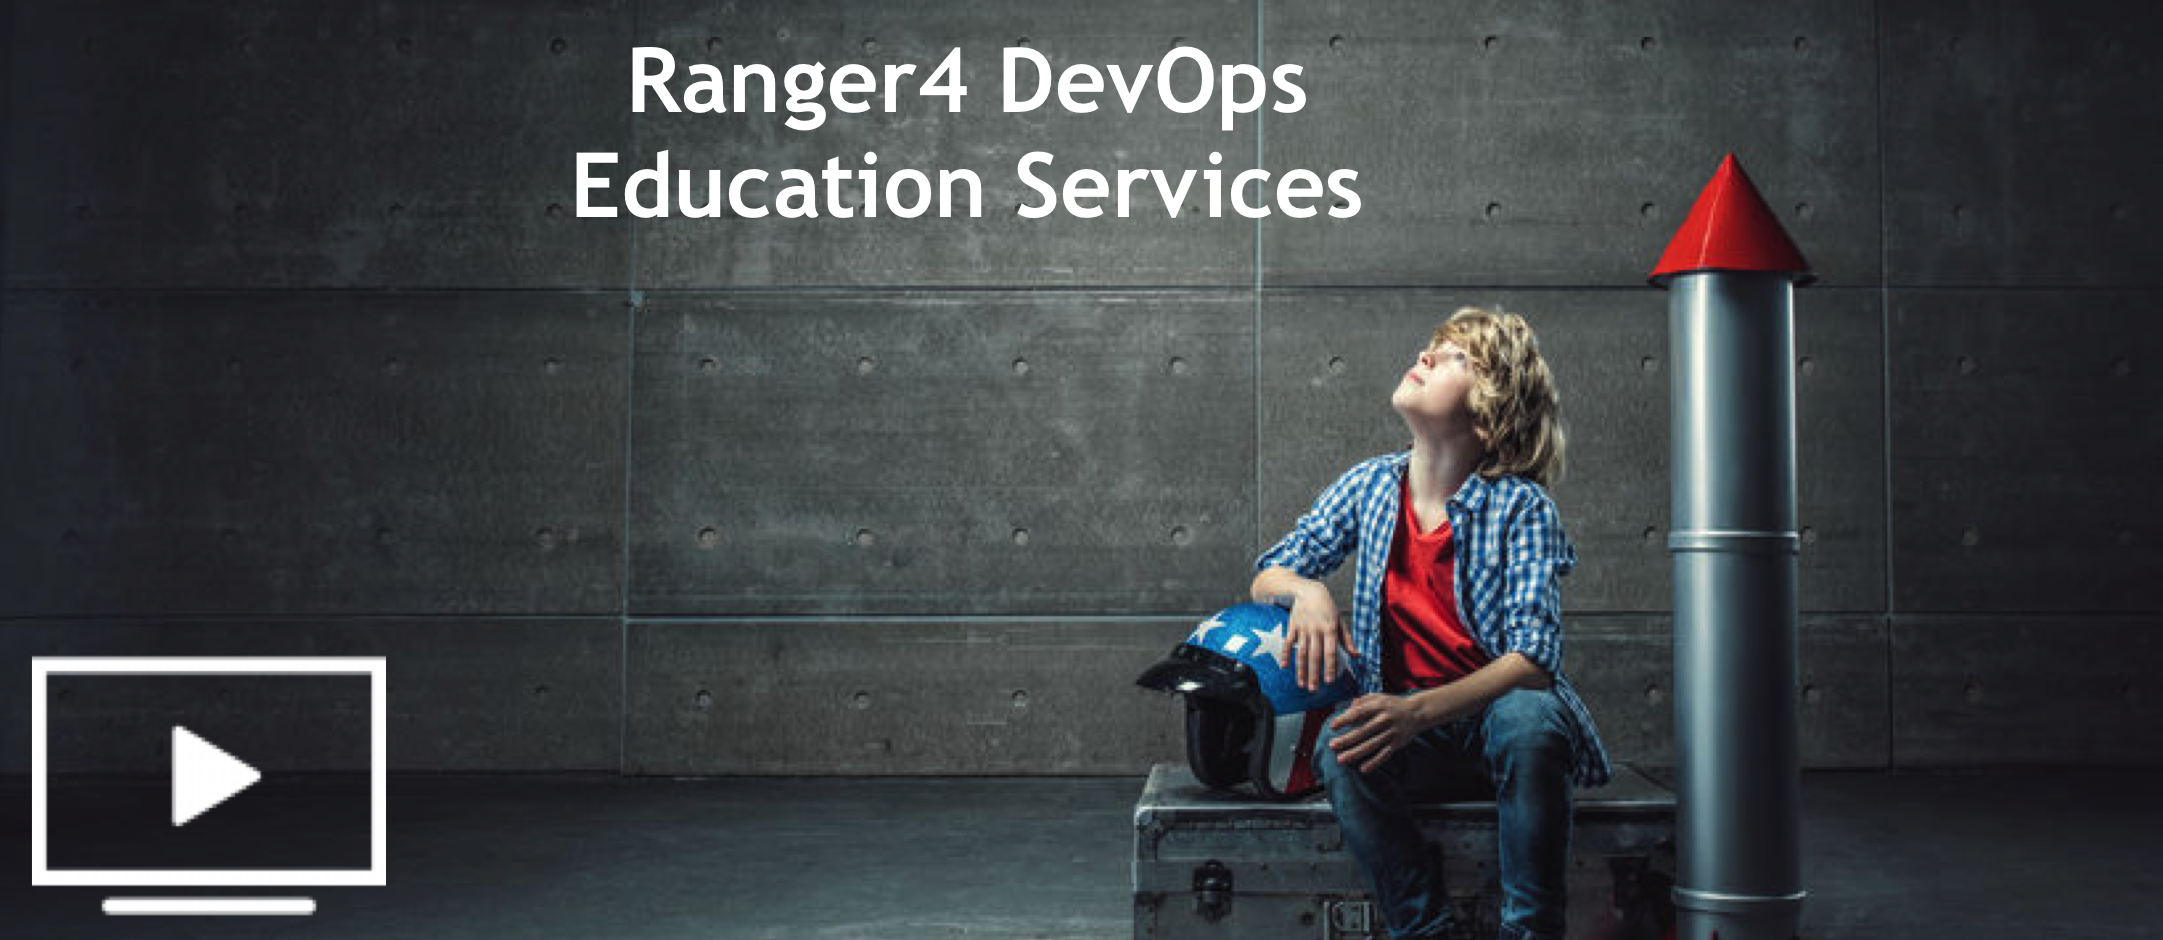 Ranger4 DevOps Education Services webcast landing page cover.png